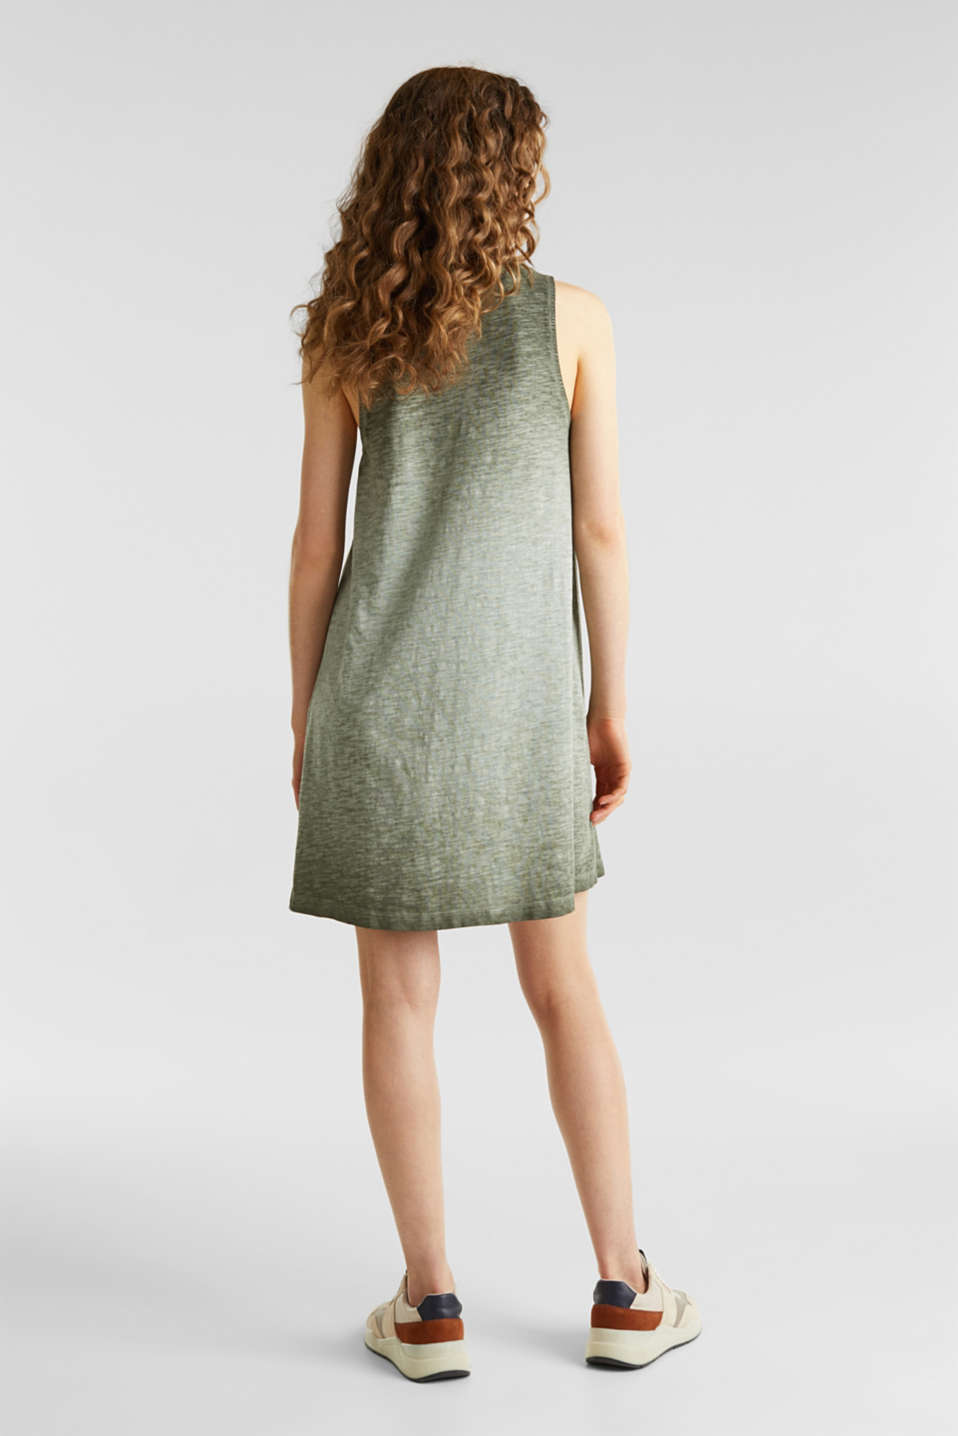 Cotton jersey dress, KHAKI GREEN, detail image number 2